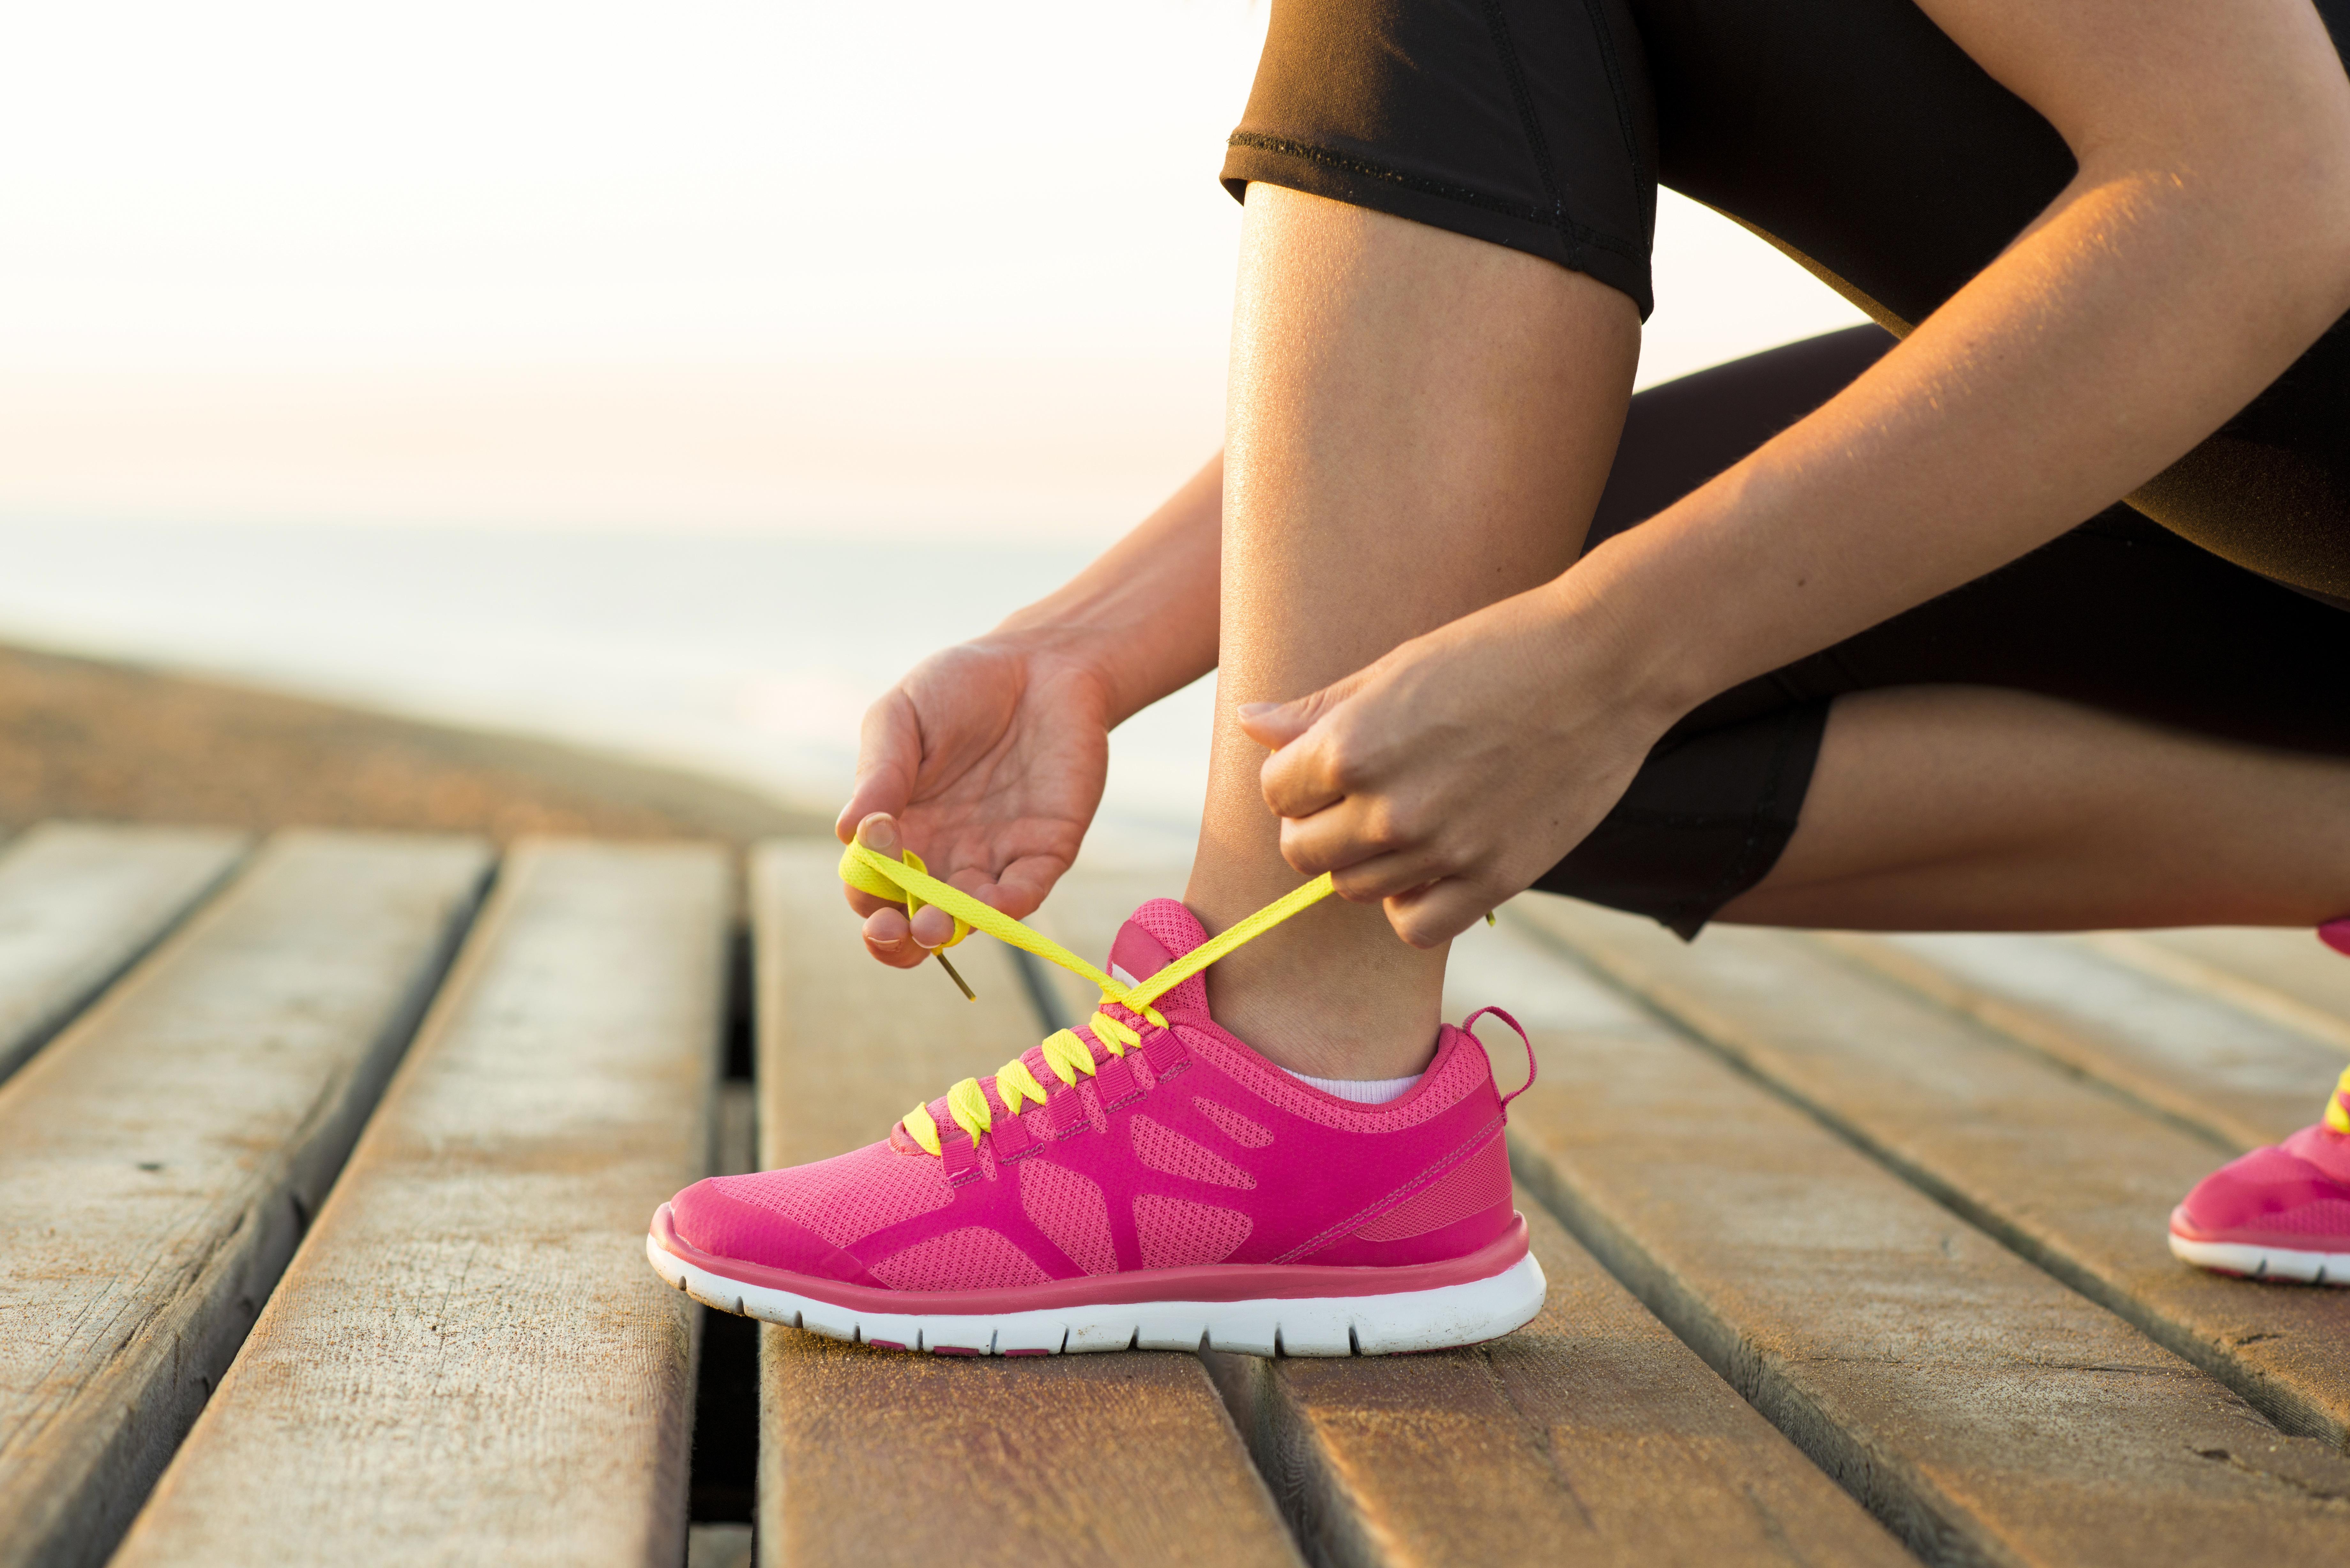 Improve Running Form